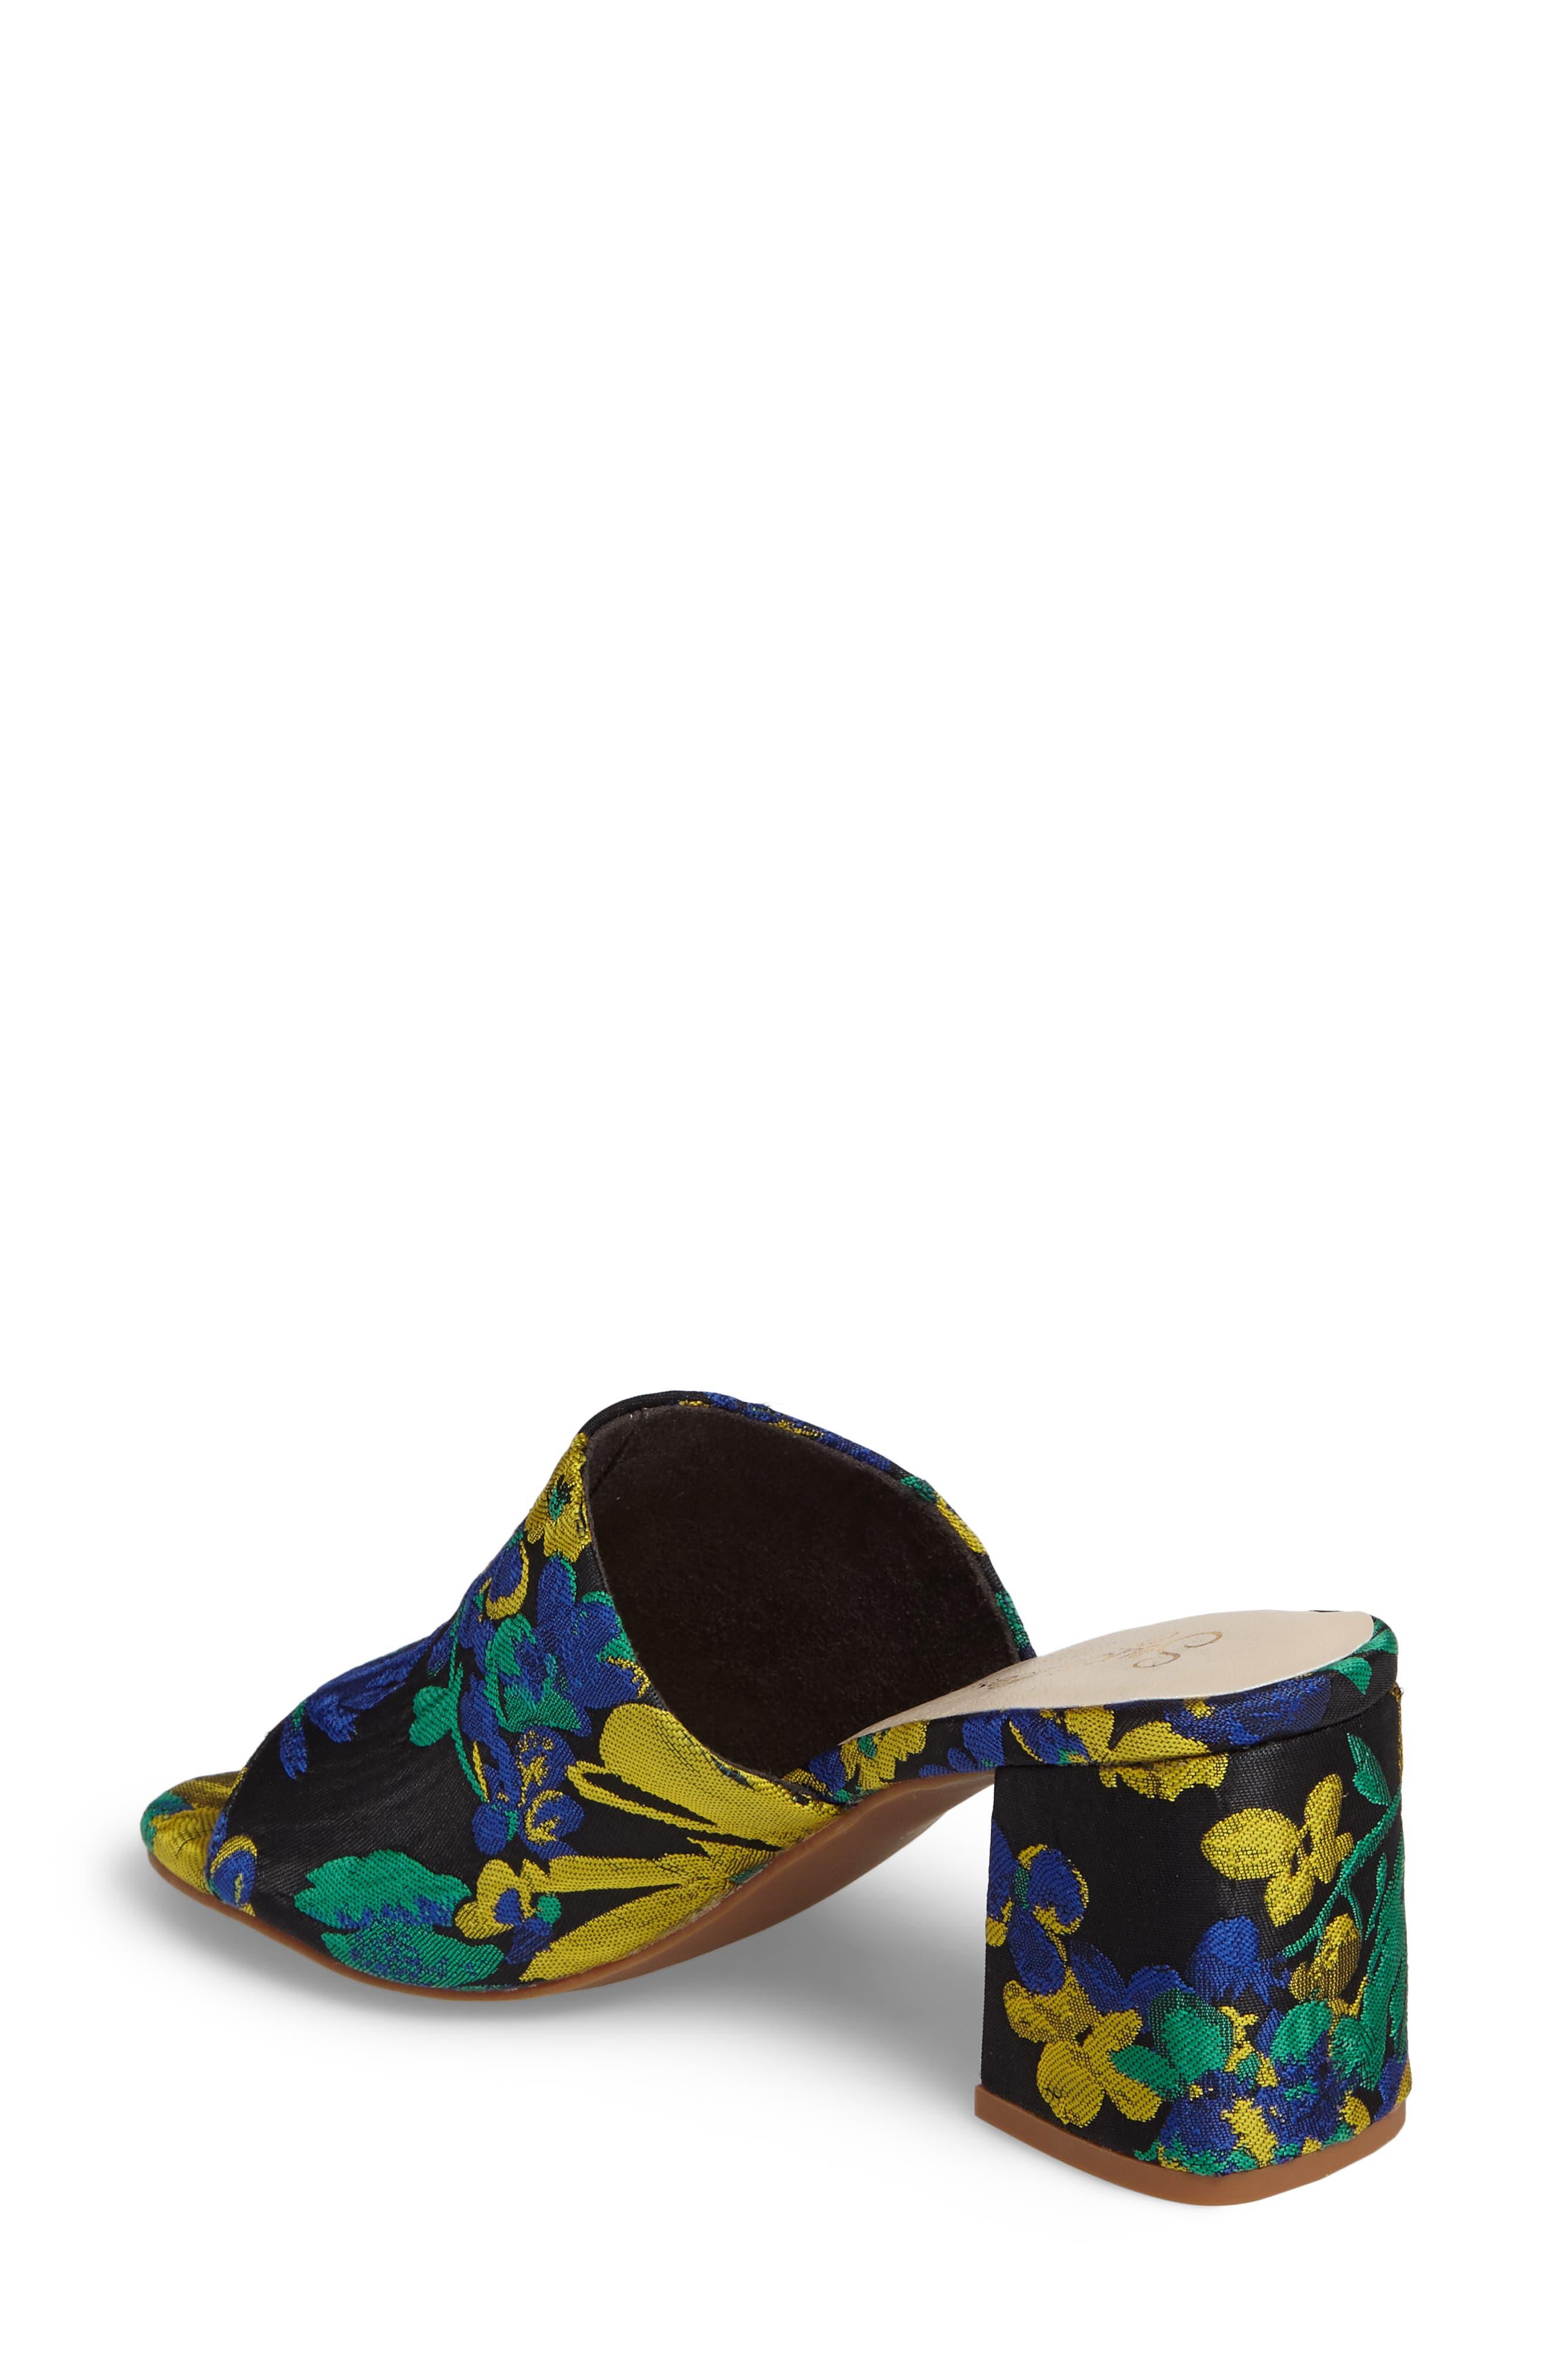 Commute Floral Flared Heel Sandal,                             Alternate thumbnail 2, color,                             002